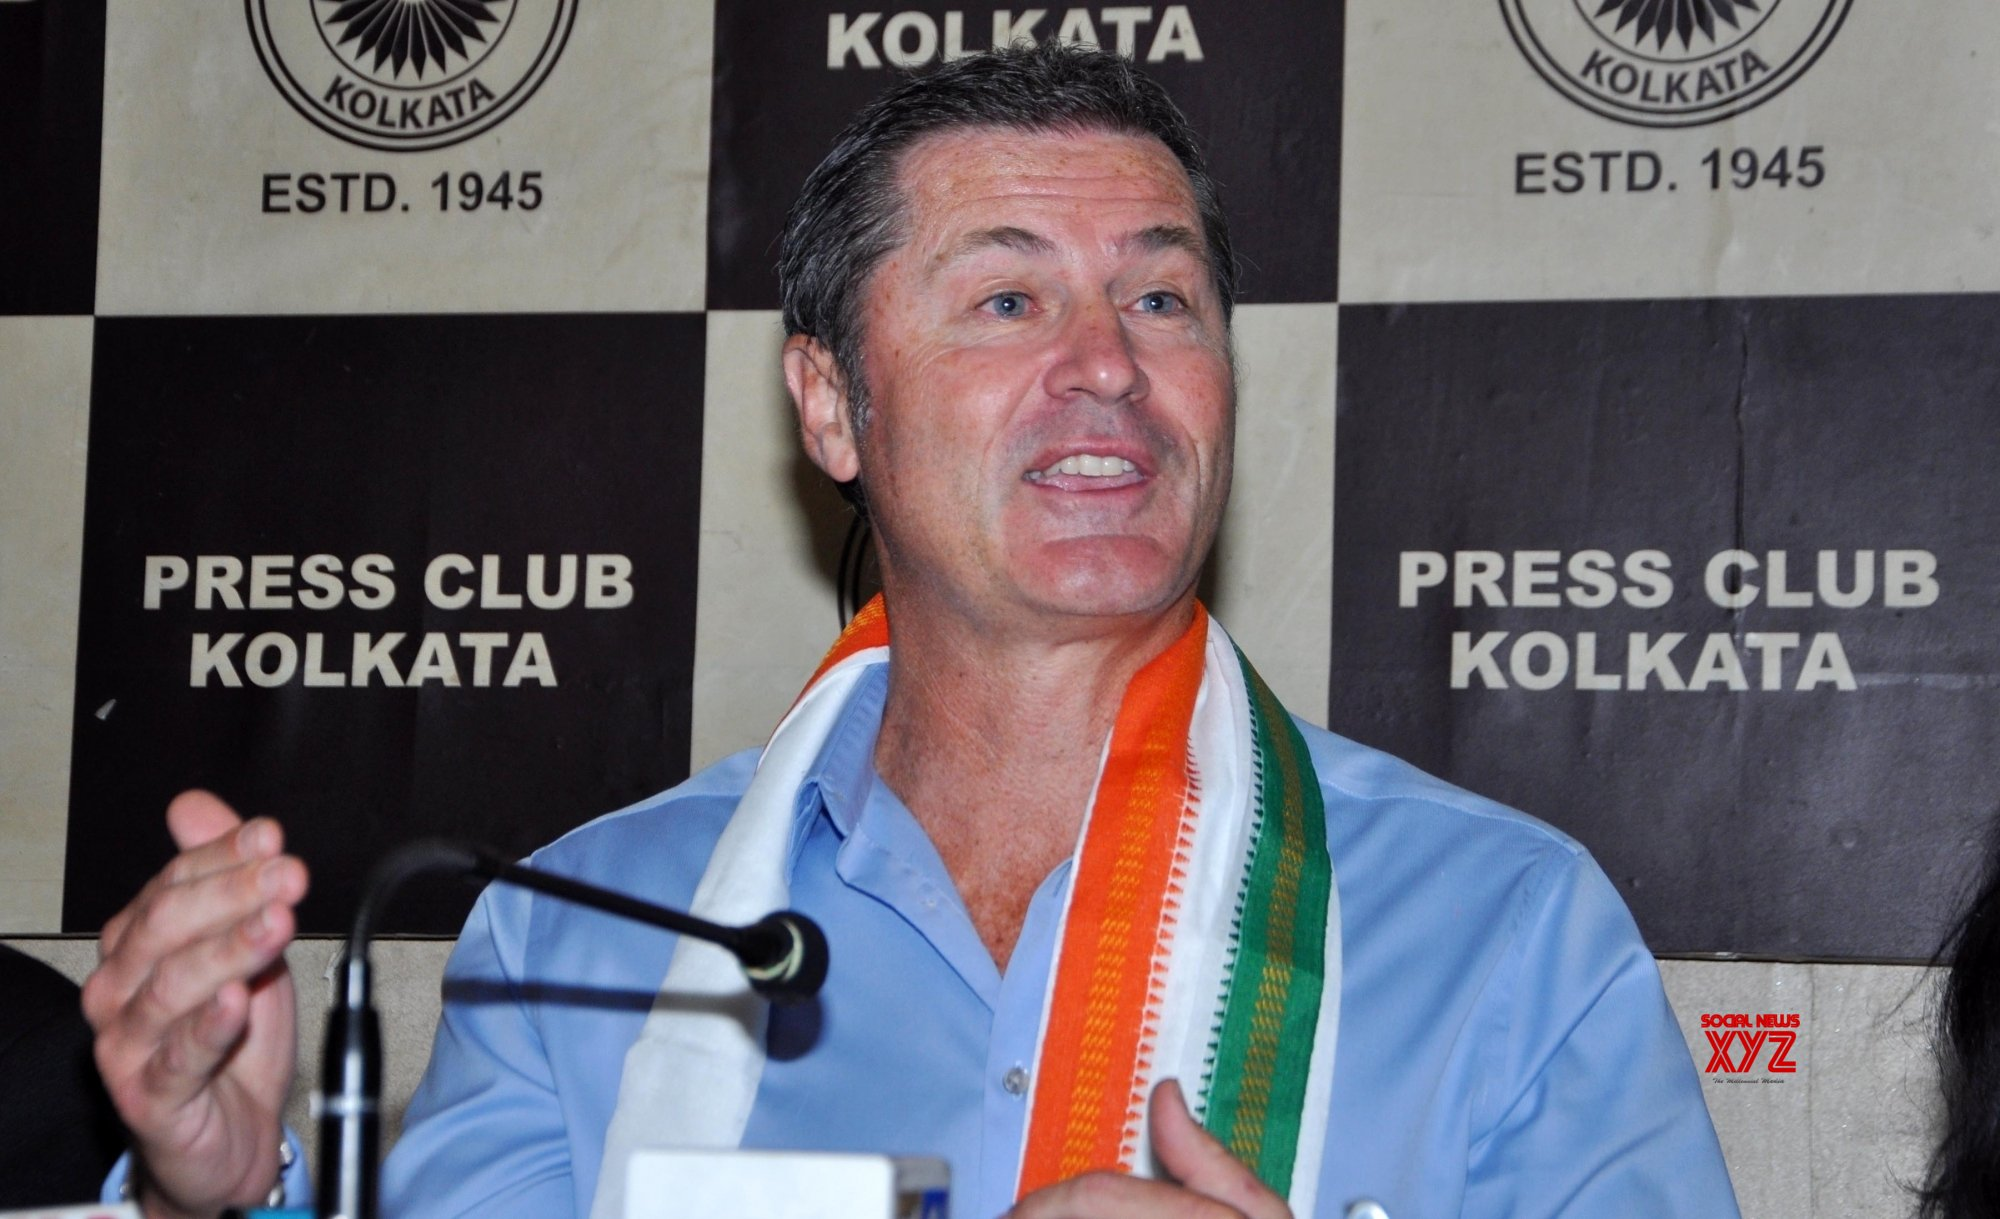 Kolkata: Simon Taufel's press conference #Gallery